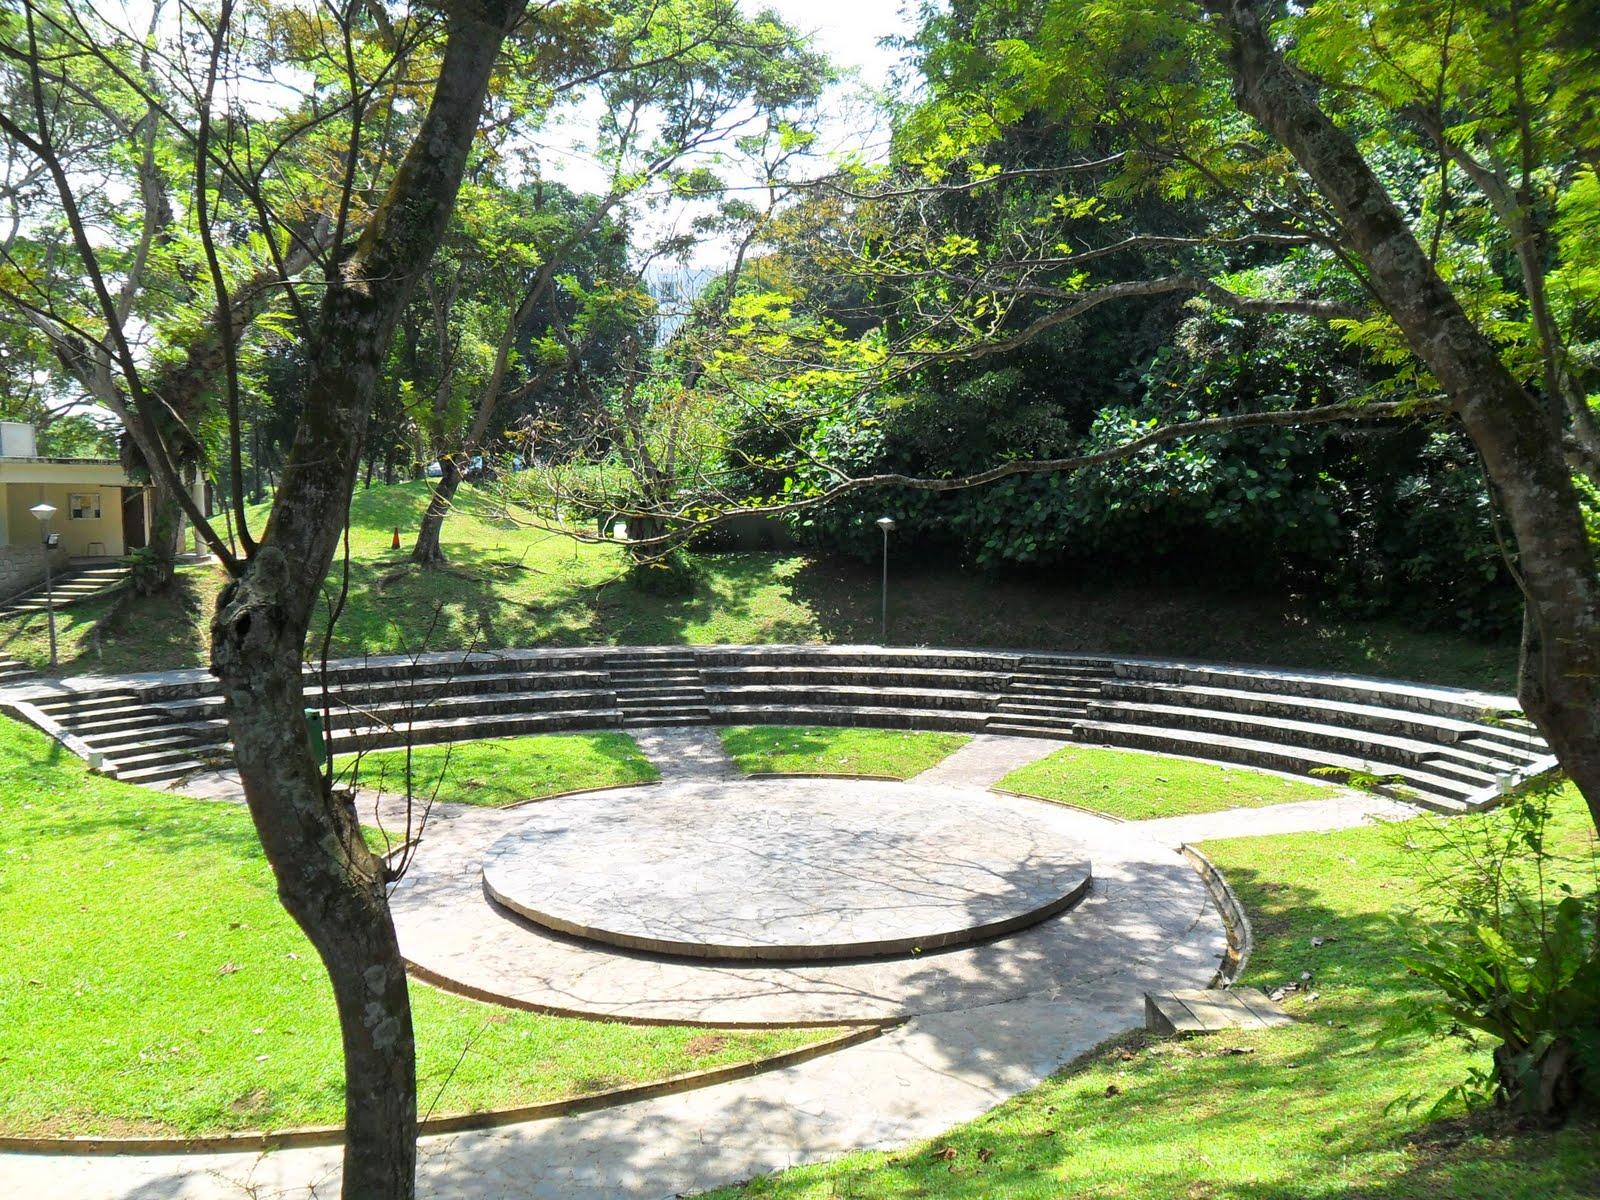 clementi-woods-amphitheatre-southern-ridges-walk-singapore